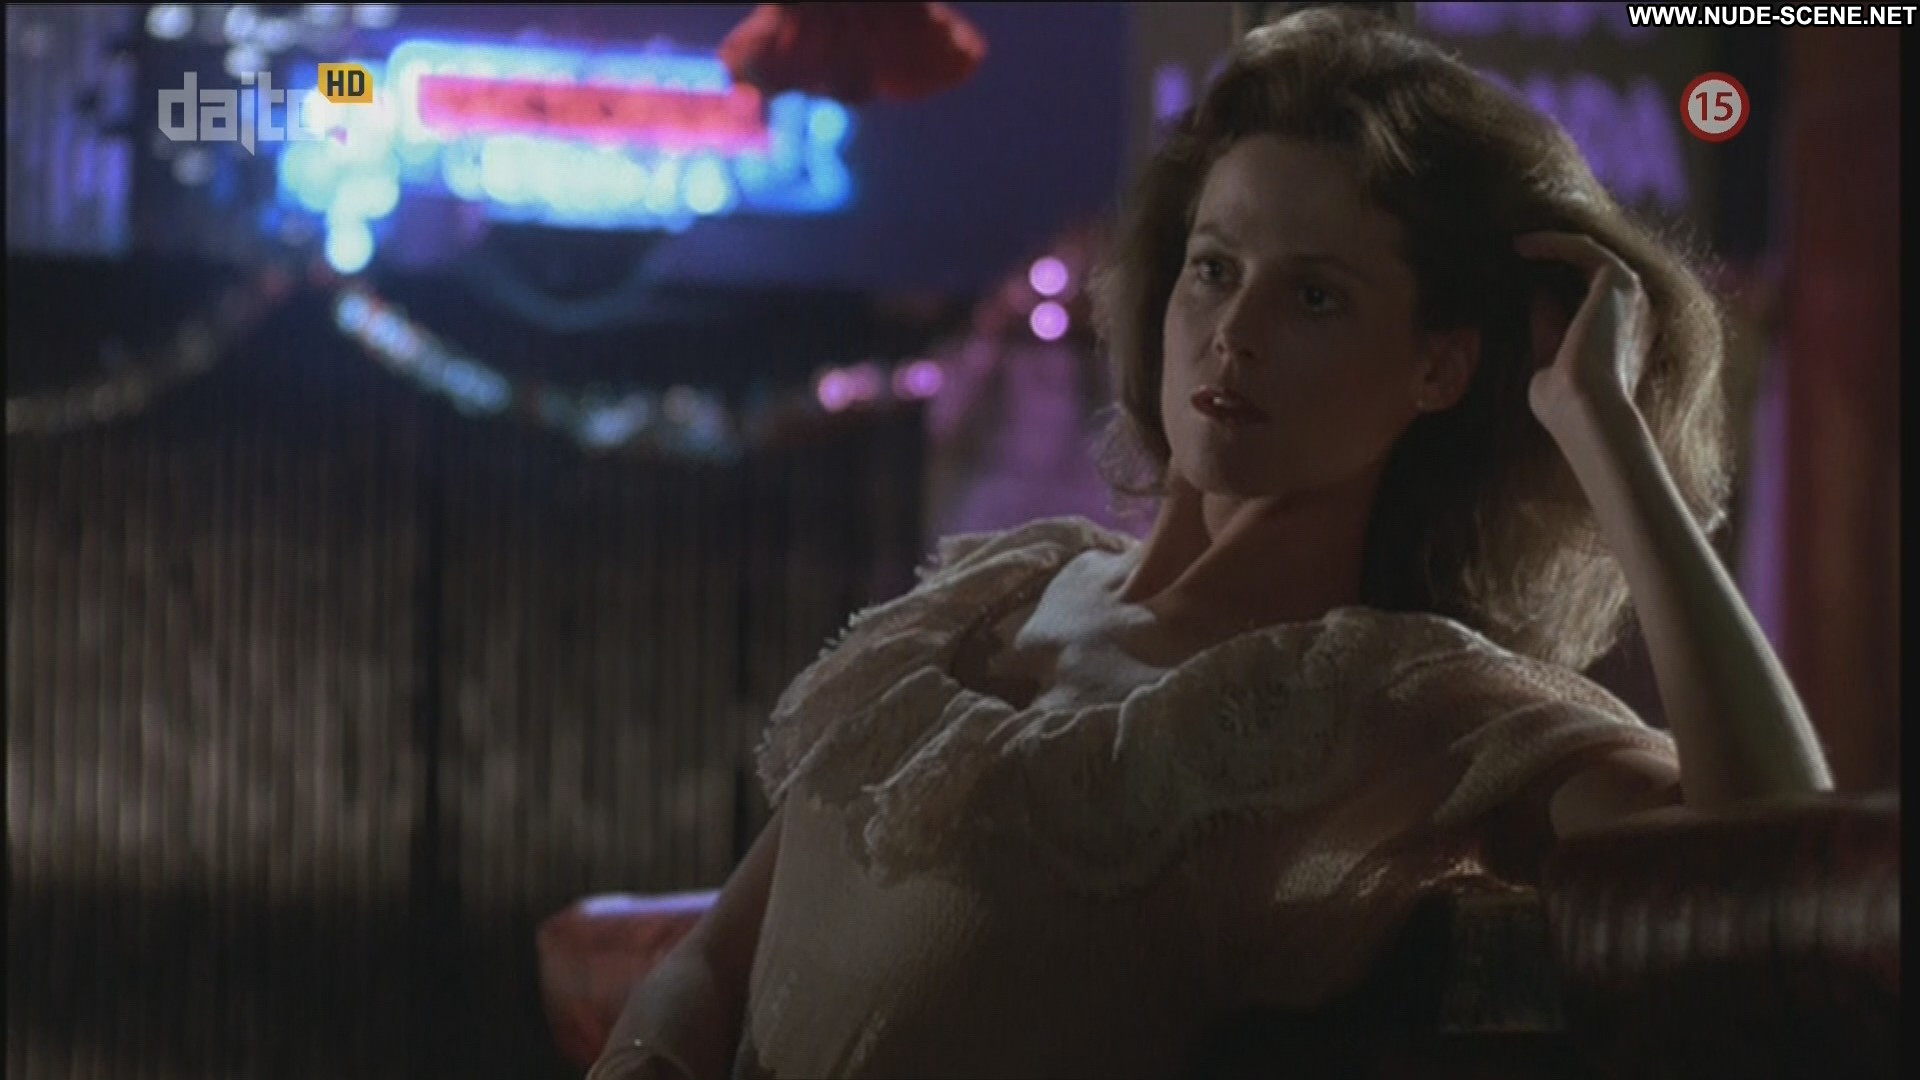 Sigourney Weaver No Source Celebrity Beautiful Babe Posing Hot